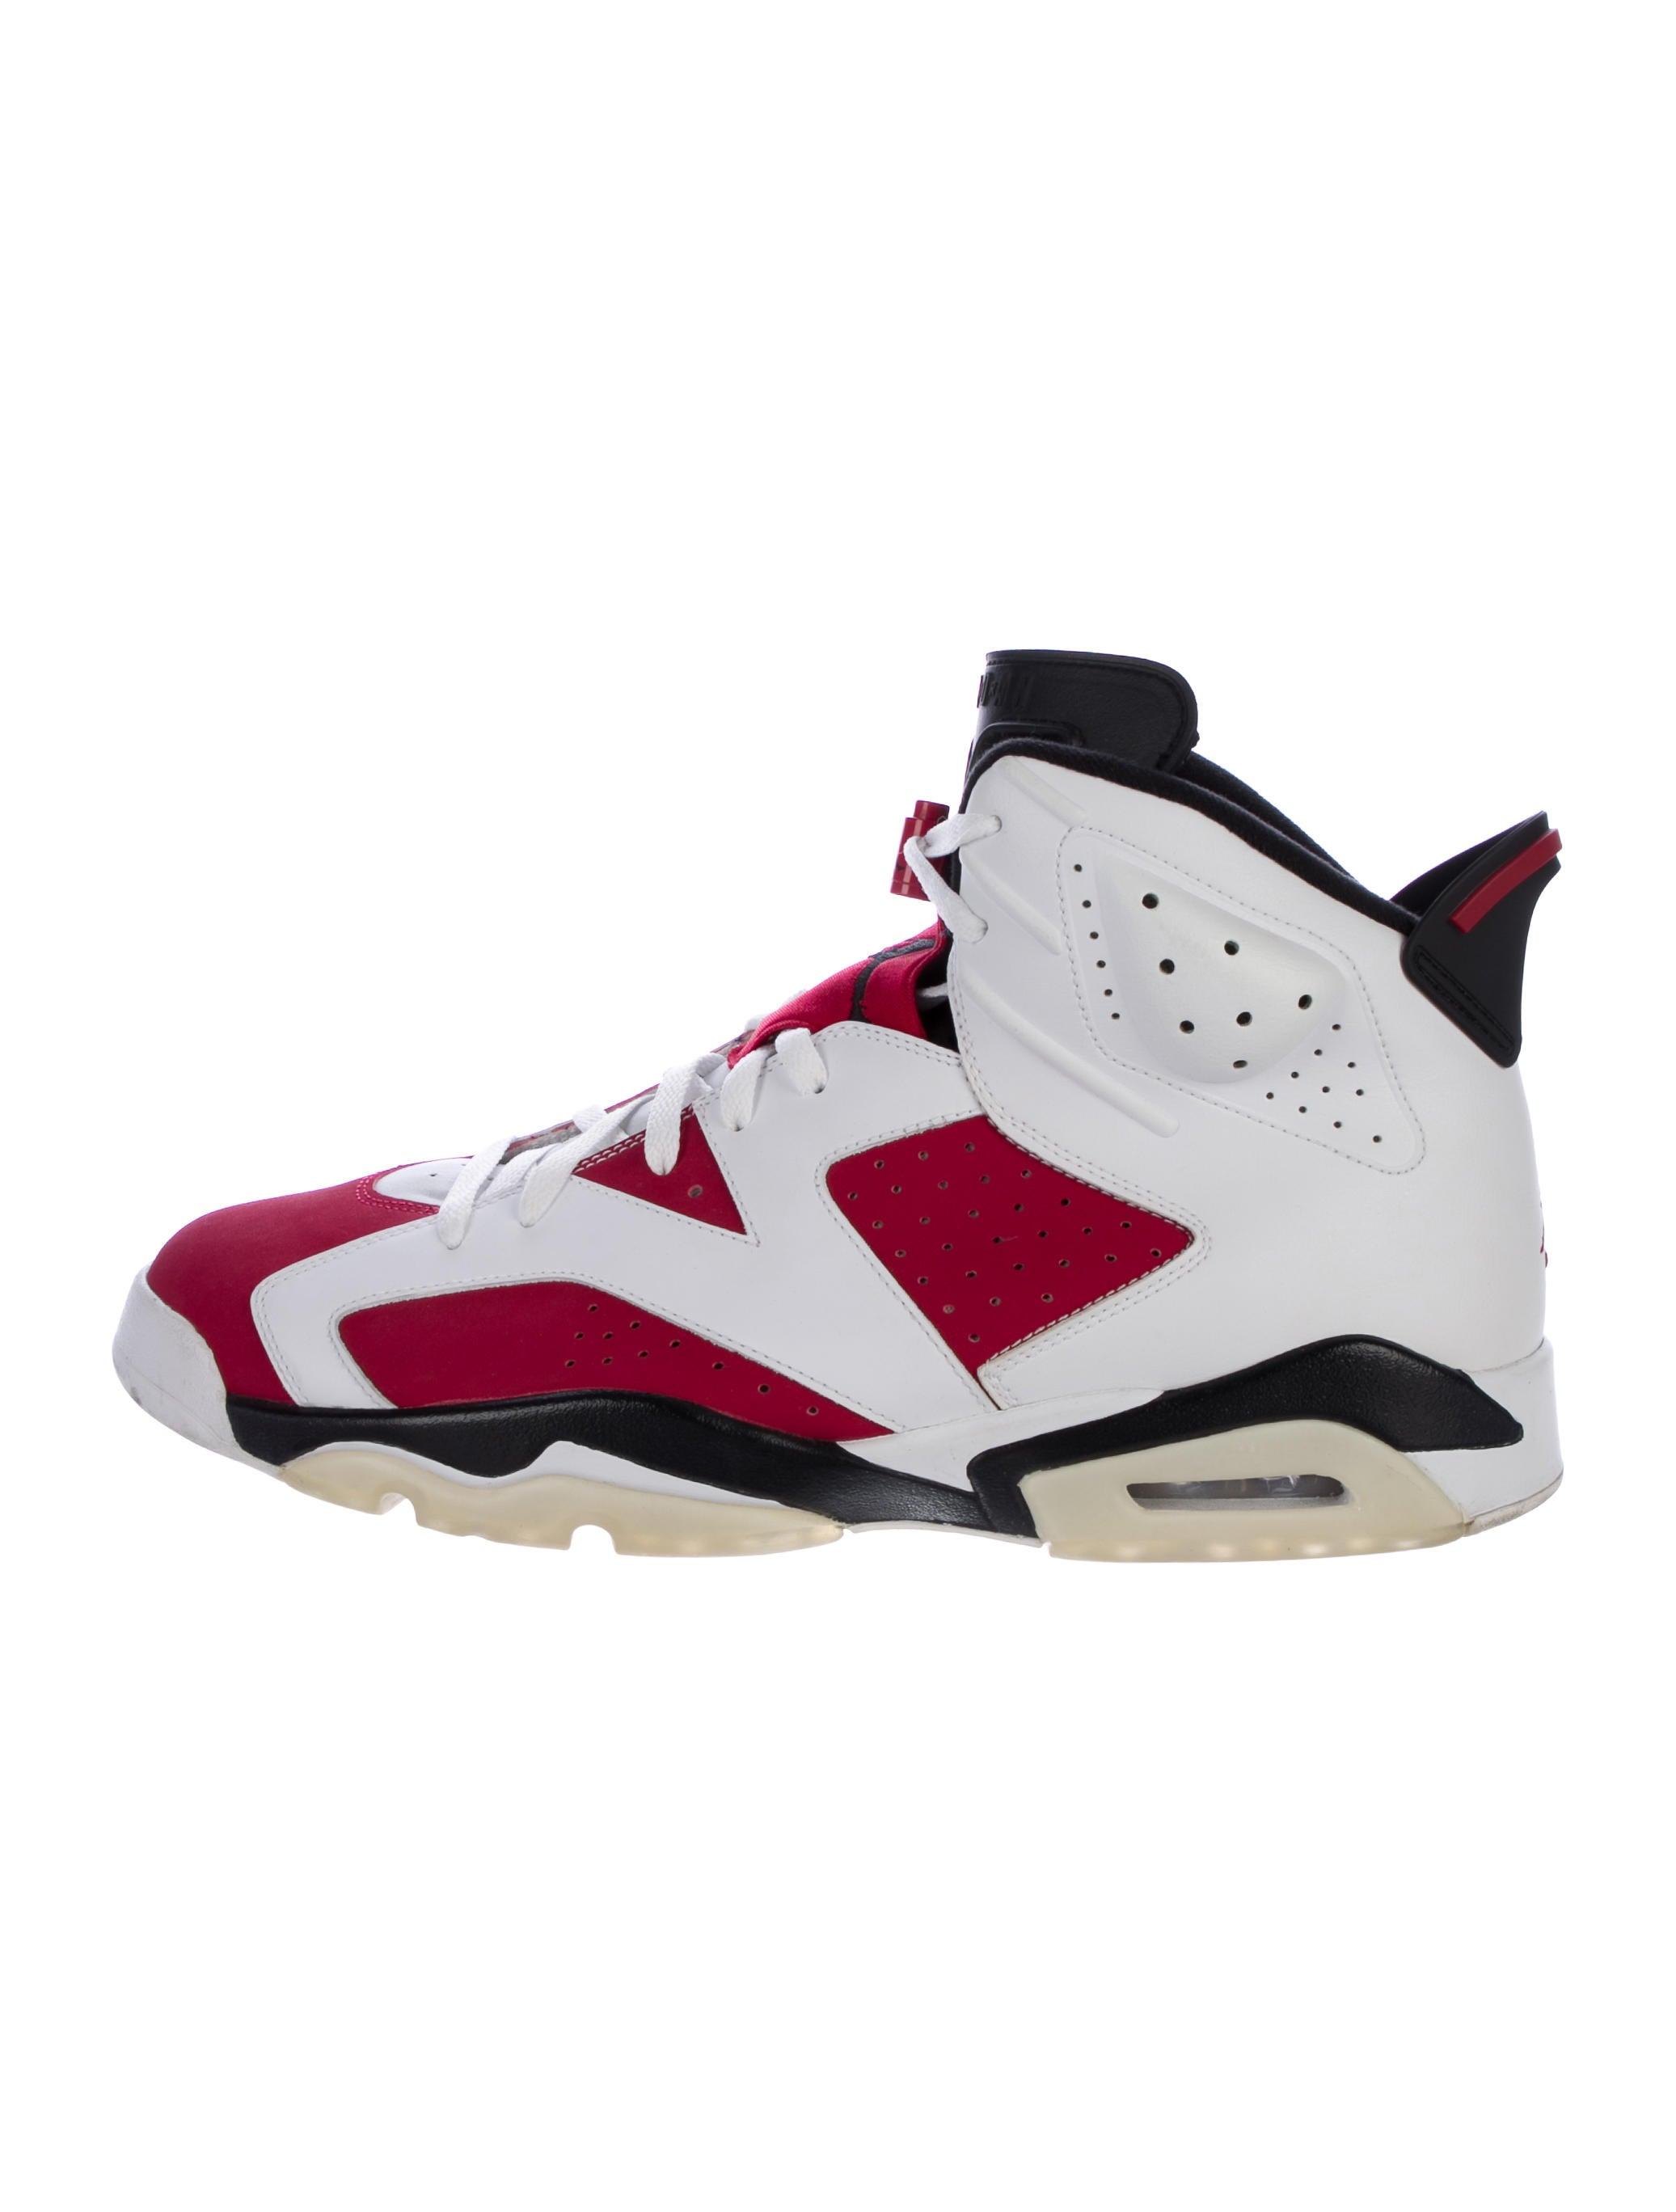 nike air jordan 6 retro high top sneakers shoes wniaj20369 the realreal. Black Bedroom Furniture Sets. Home Design Ideas